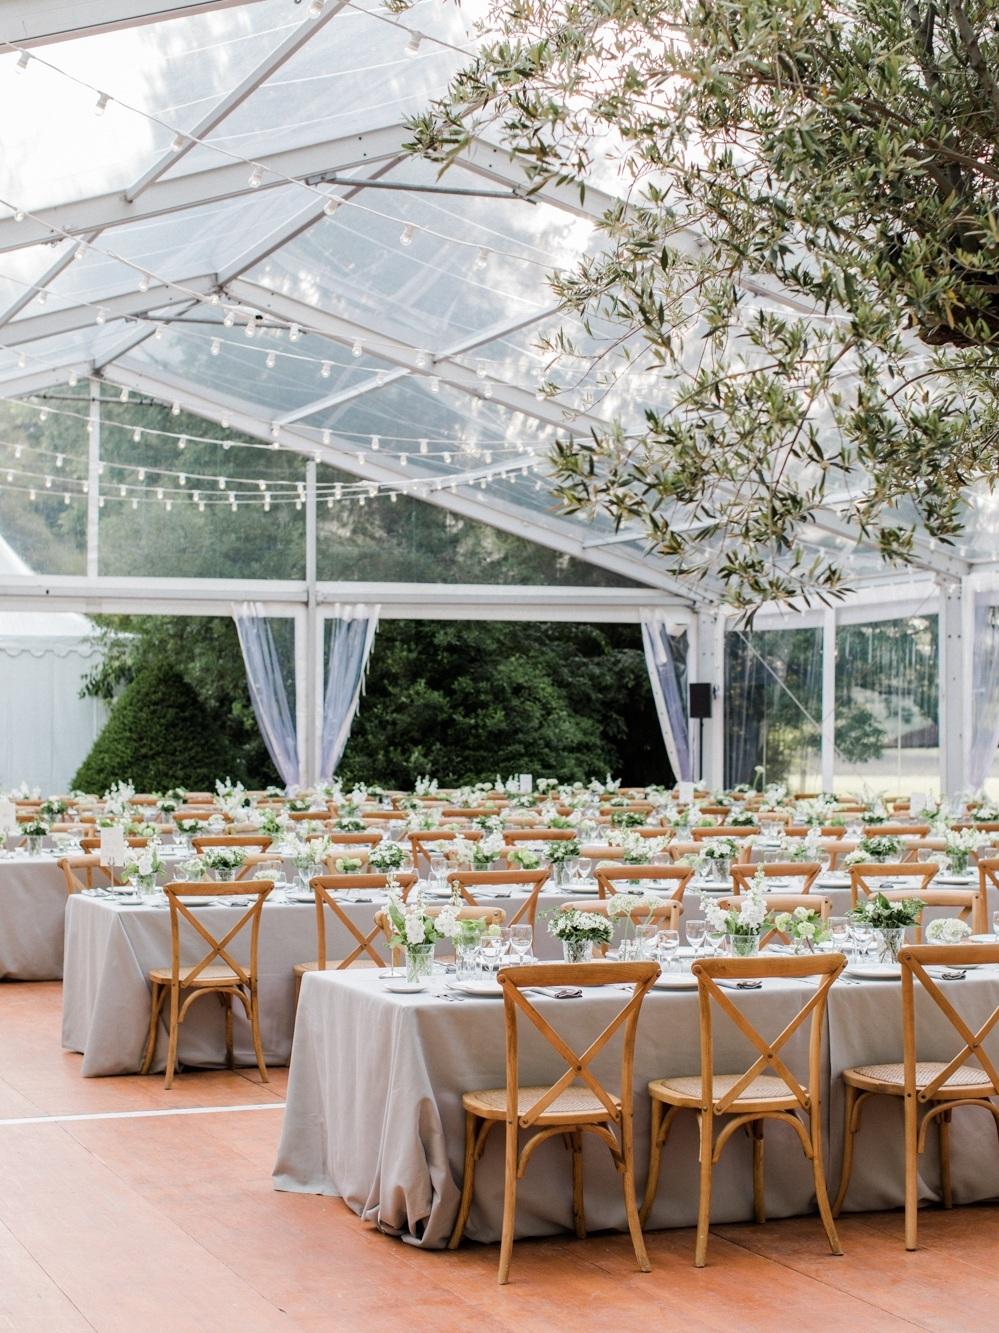 Provence_Wedding_%28c%29_Rory_Wylie-132.jpg